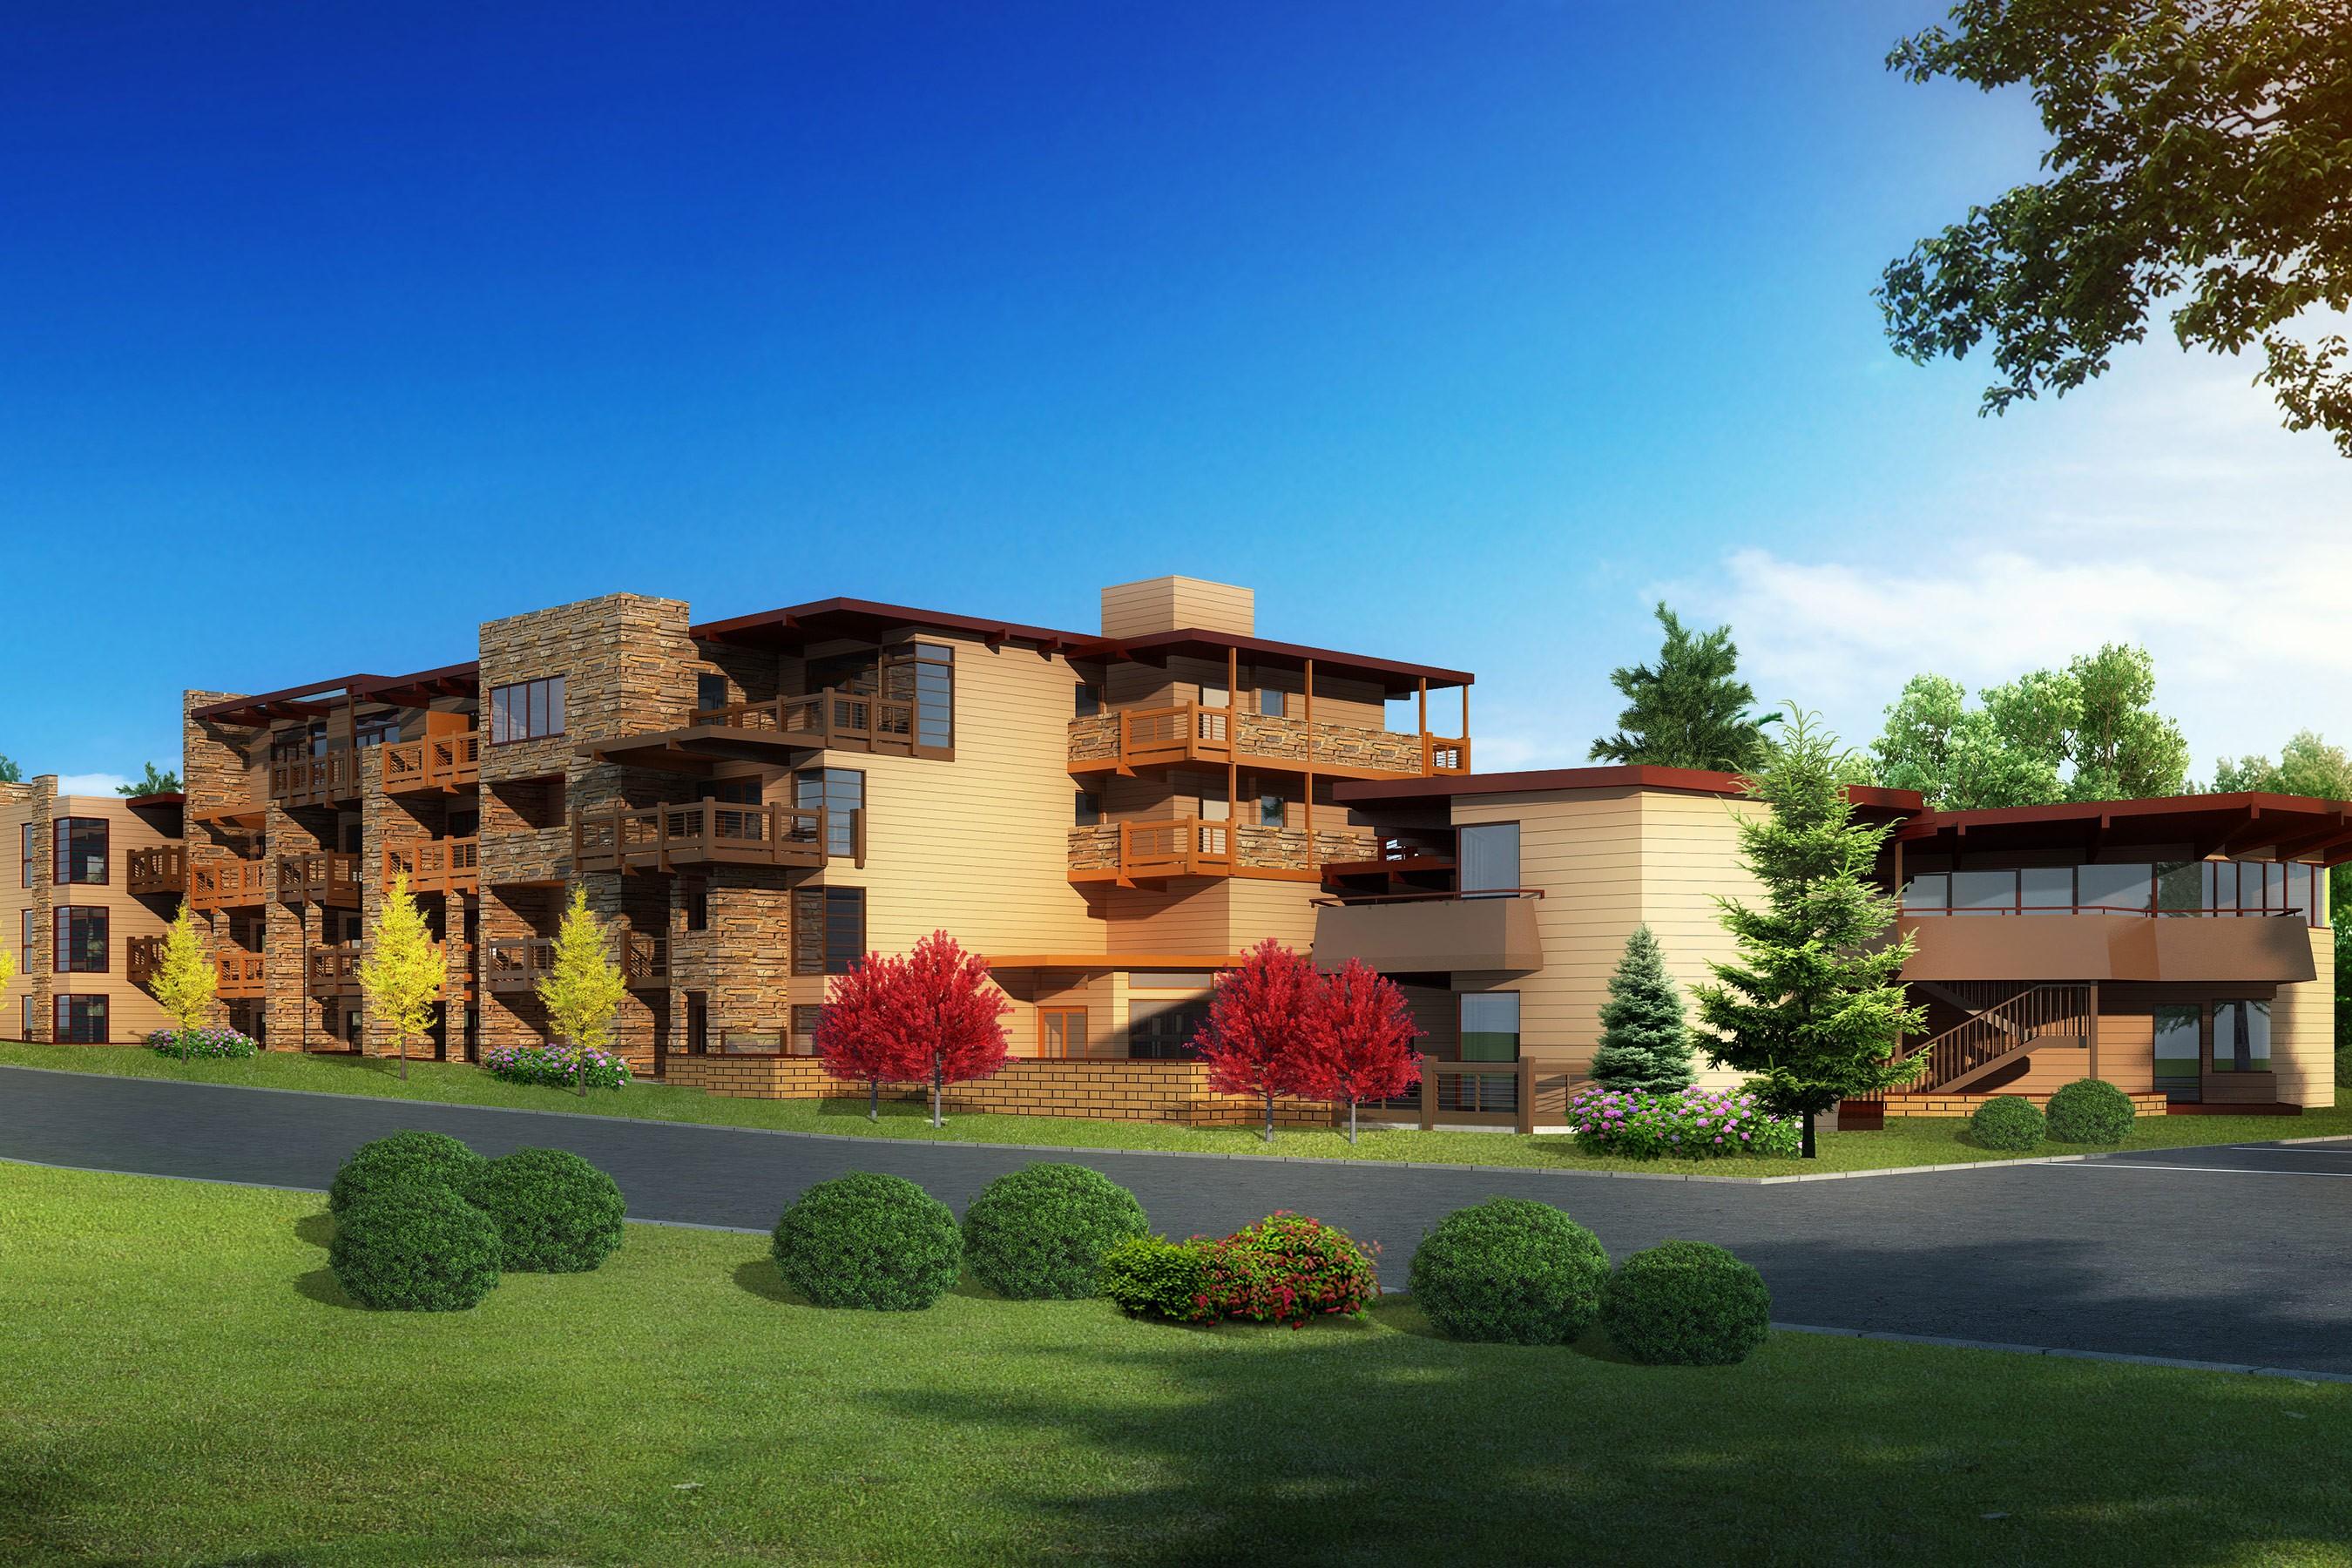 Condominium for Sale at Boomerang Lodge 500 W. Hopkins Avenue Unit 401 Aspen, Colorado, 81611 United States